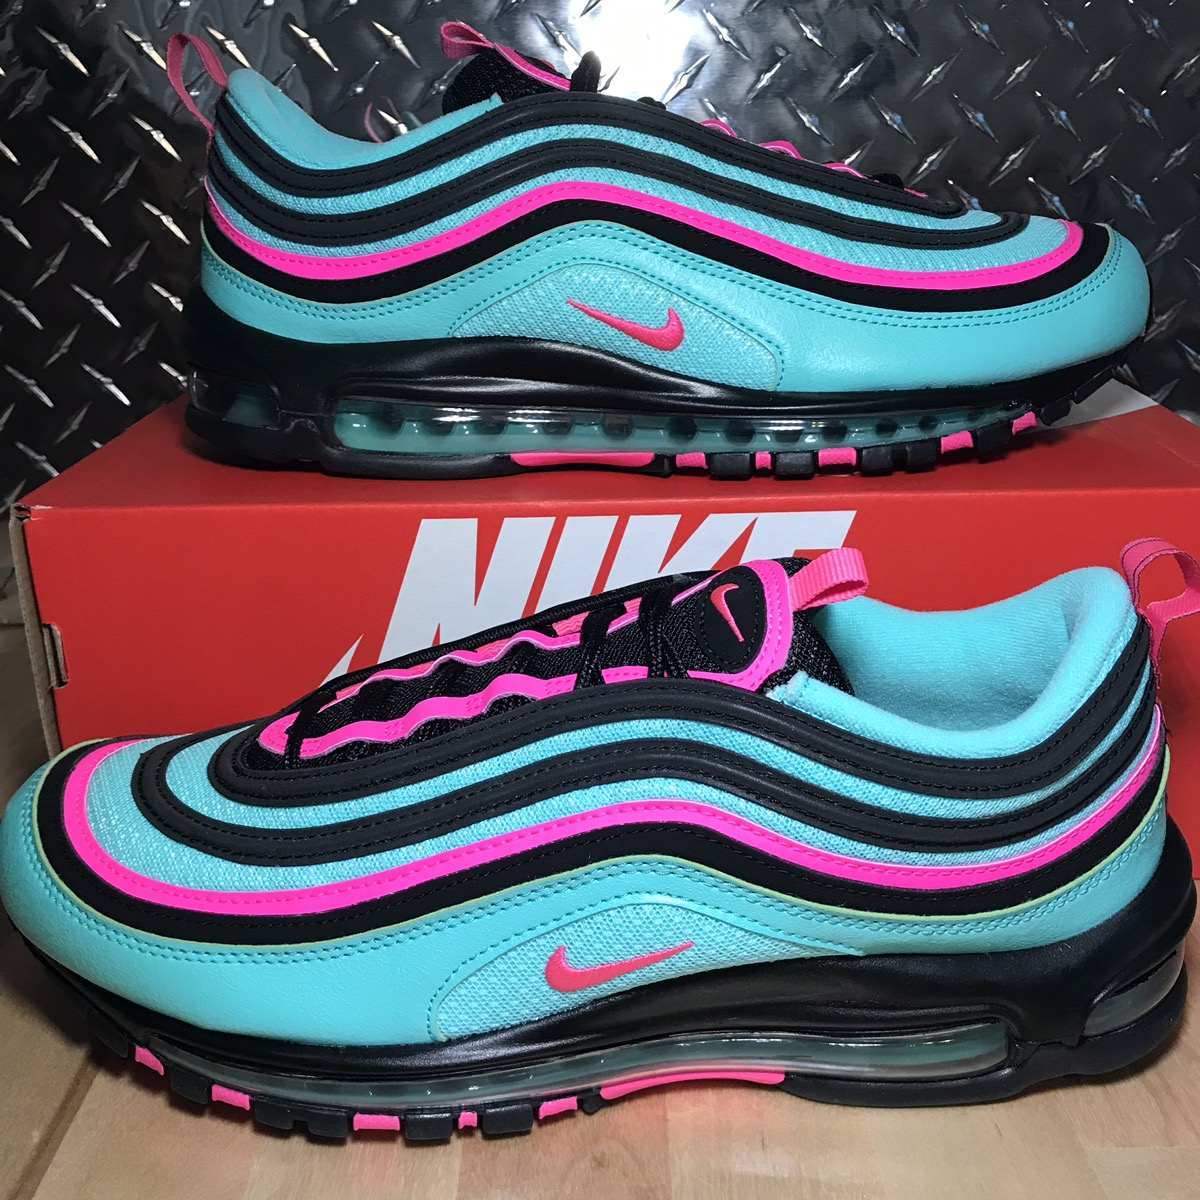 Nike Nike Air Max 97 'Hyper Turquoise'